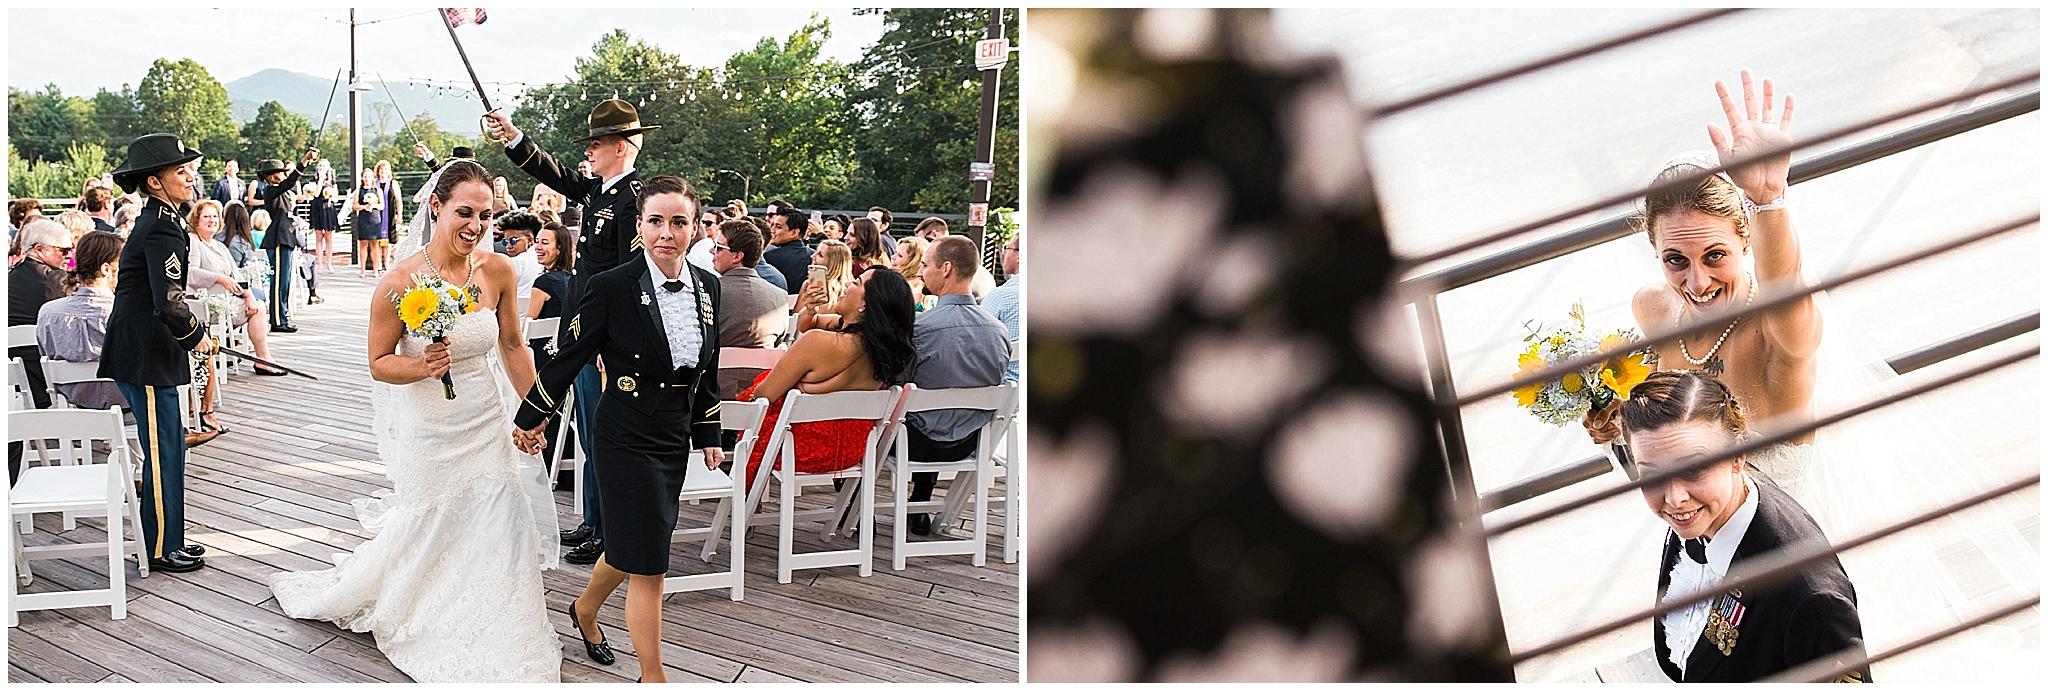 Wedding_Asheville_Highland_Brewing_Photographer_21.jpg